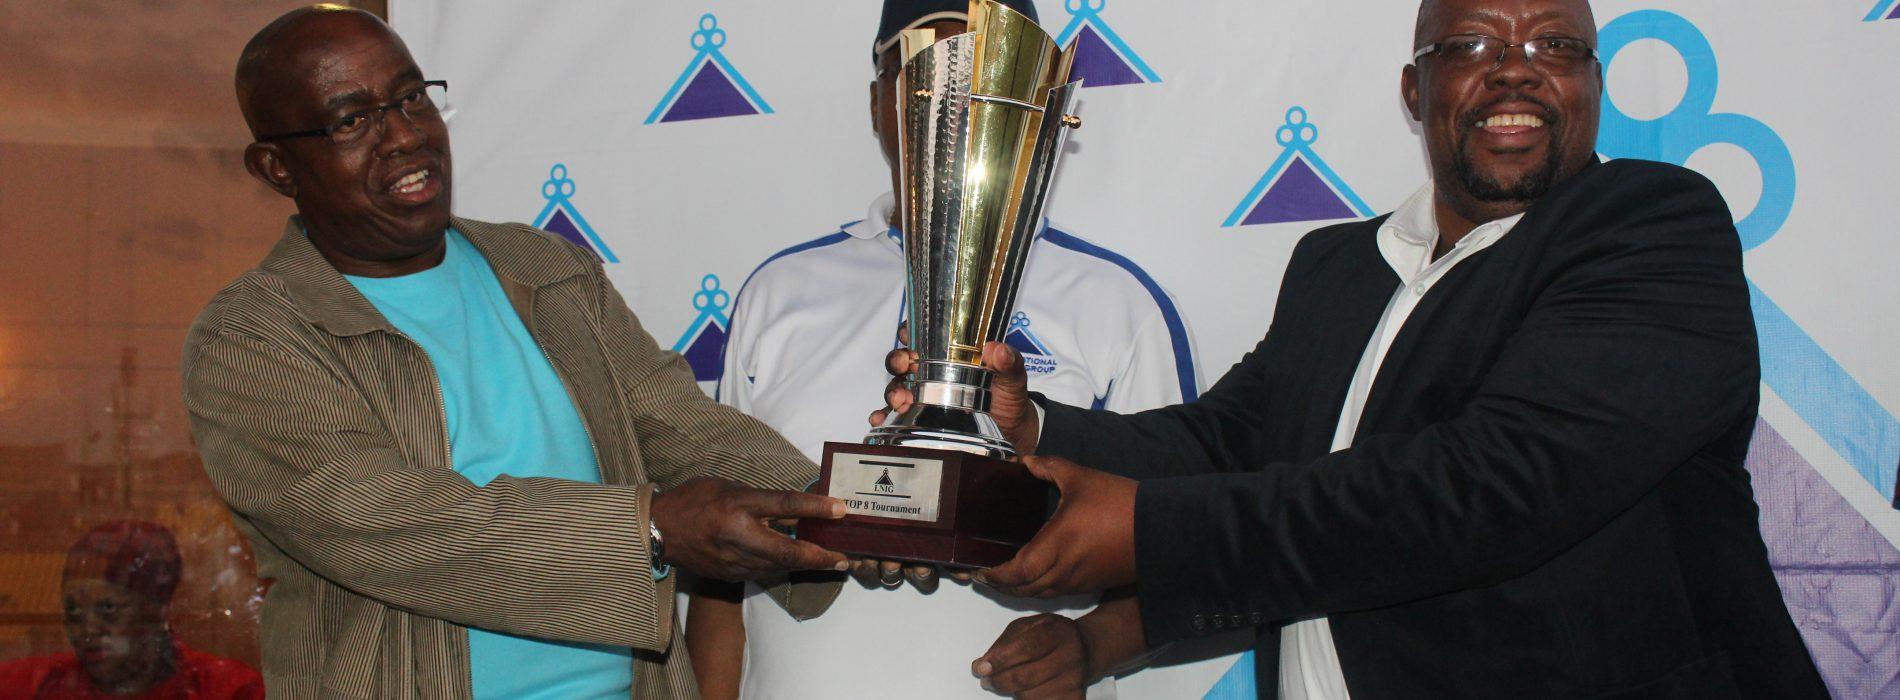 Bantu to unveil new coach